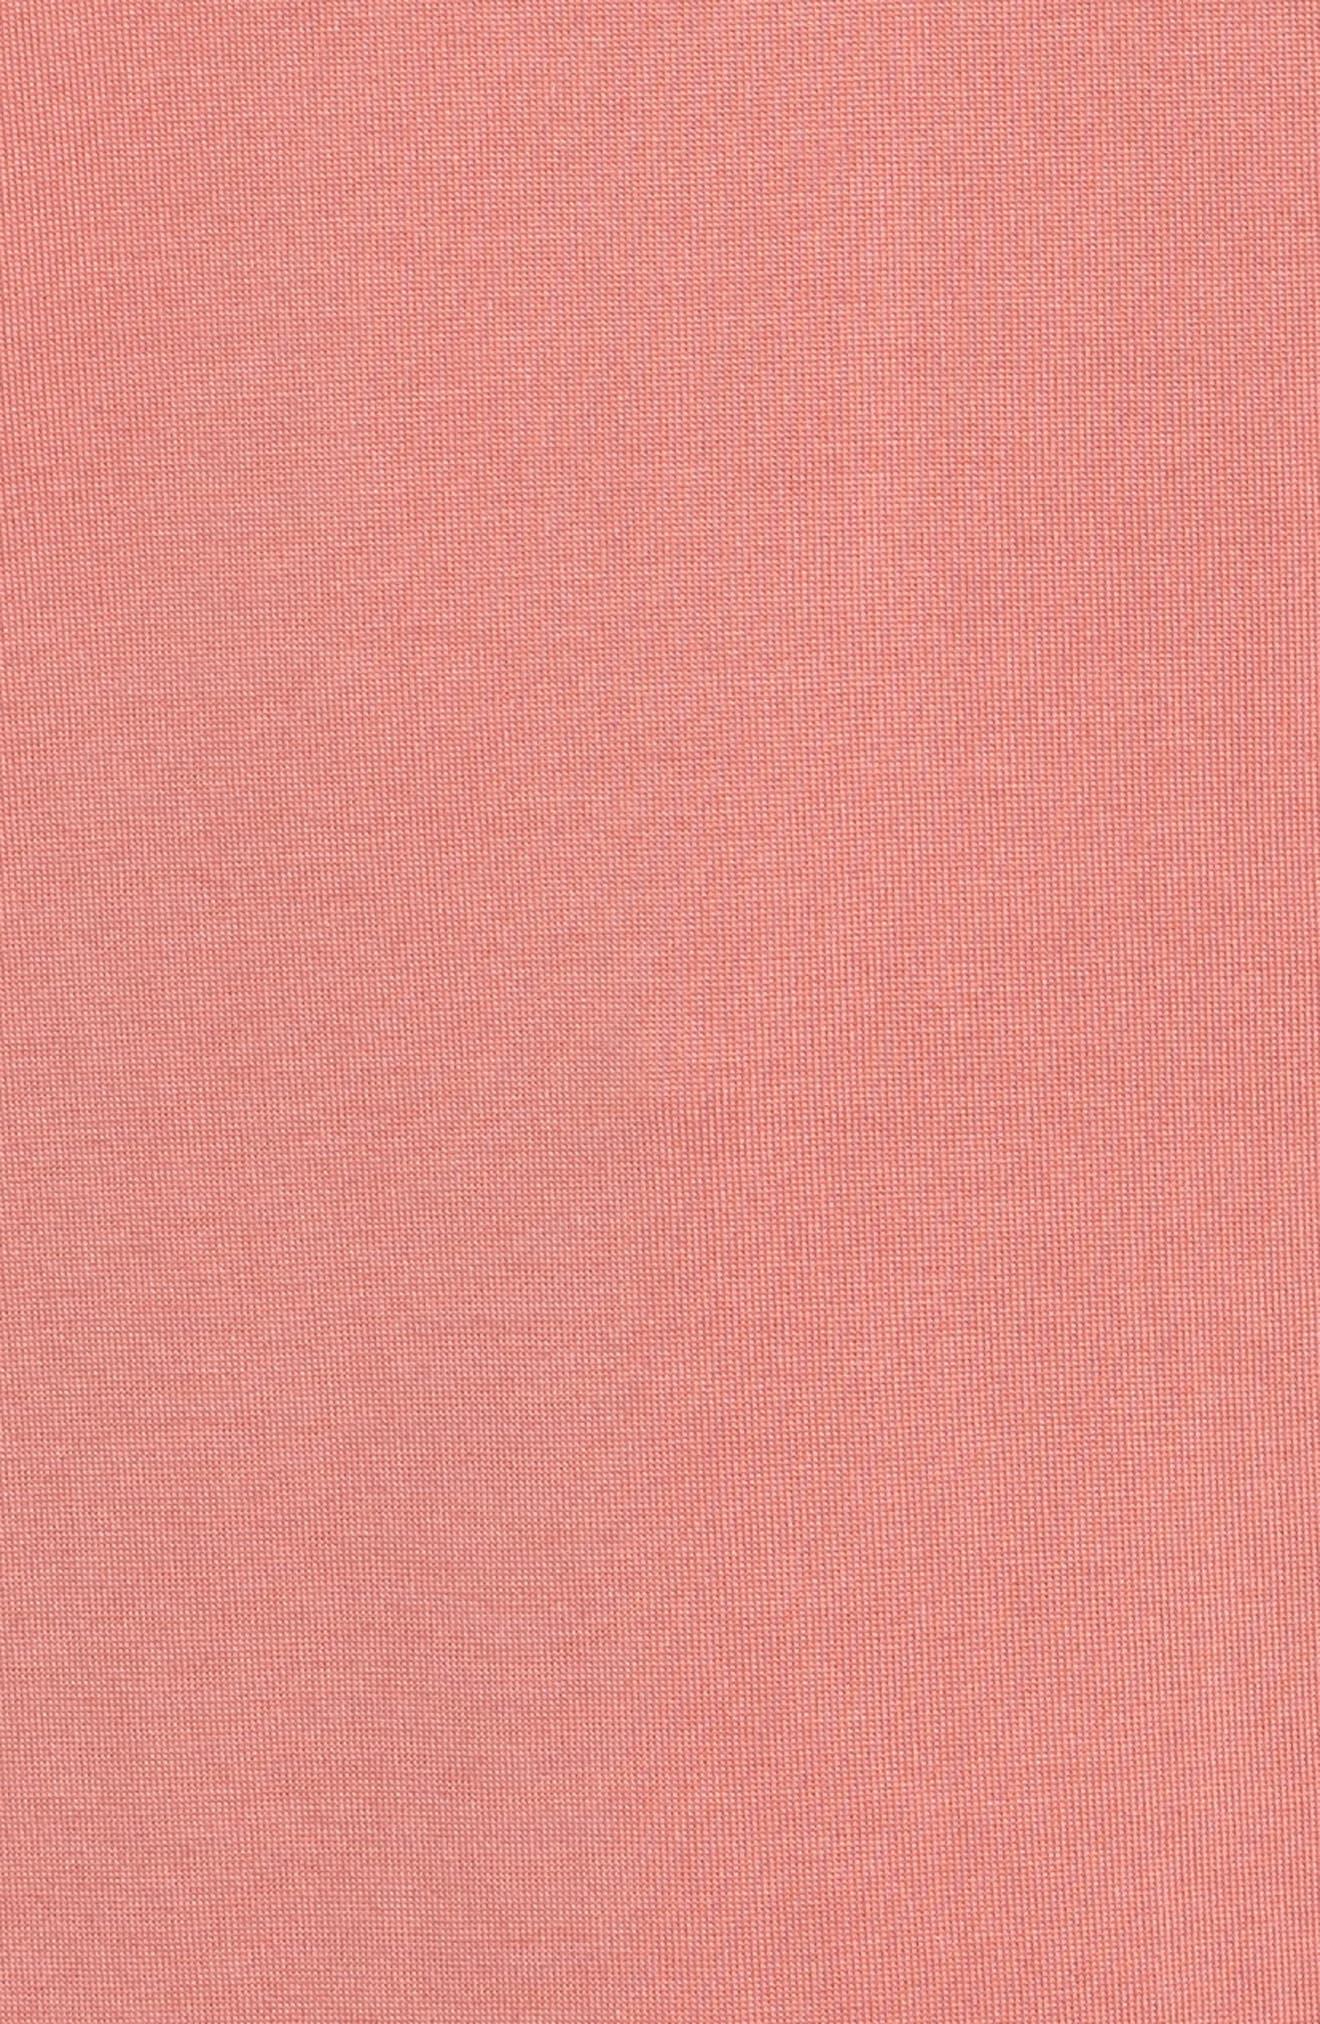 Cutout Sleeve Tee,                             Alternate thumbnail 20, color,